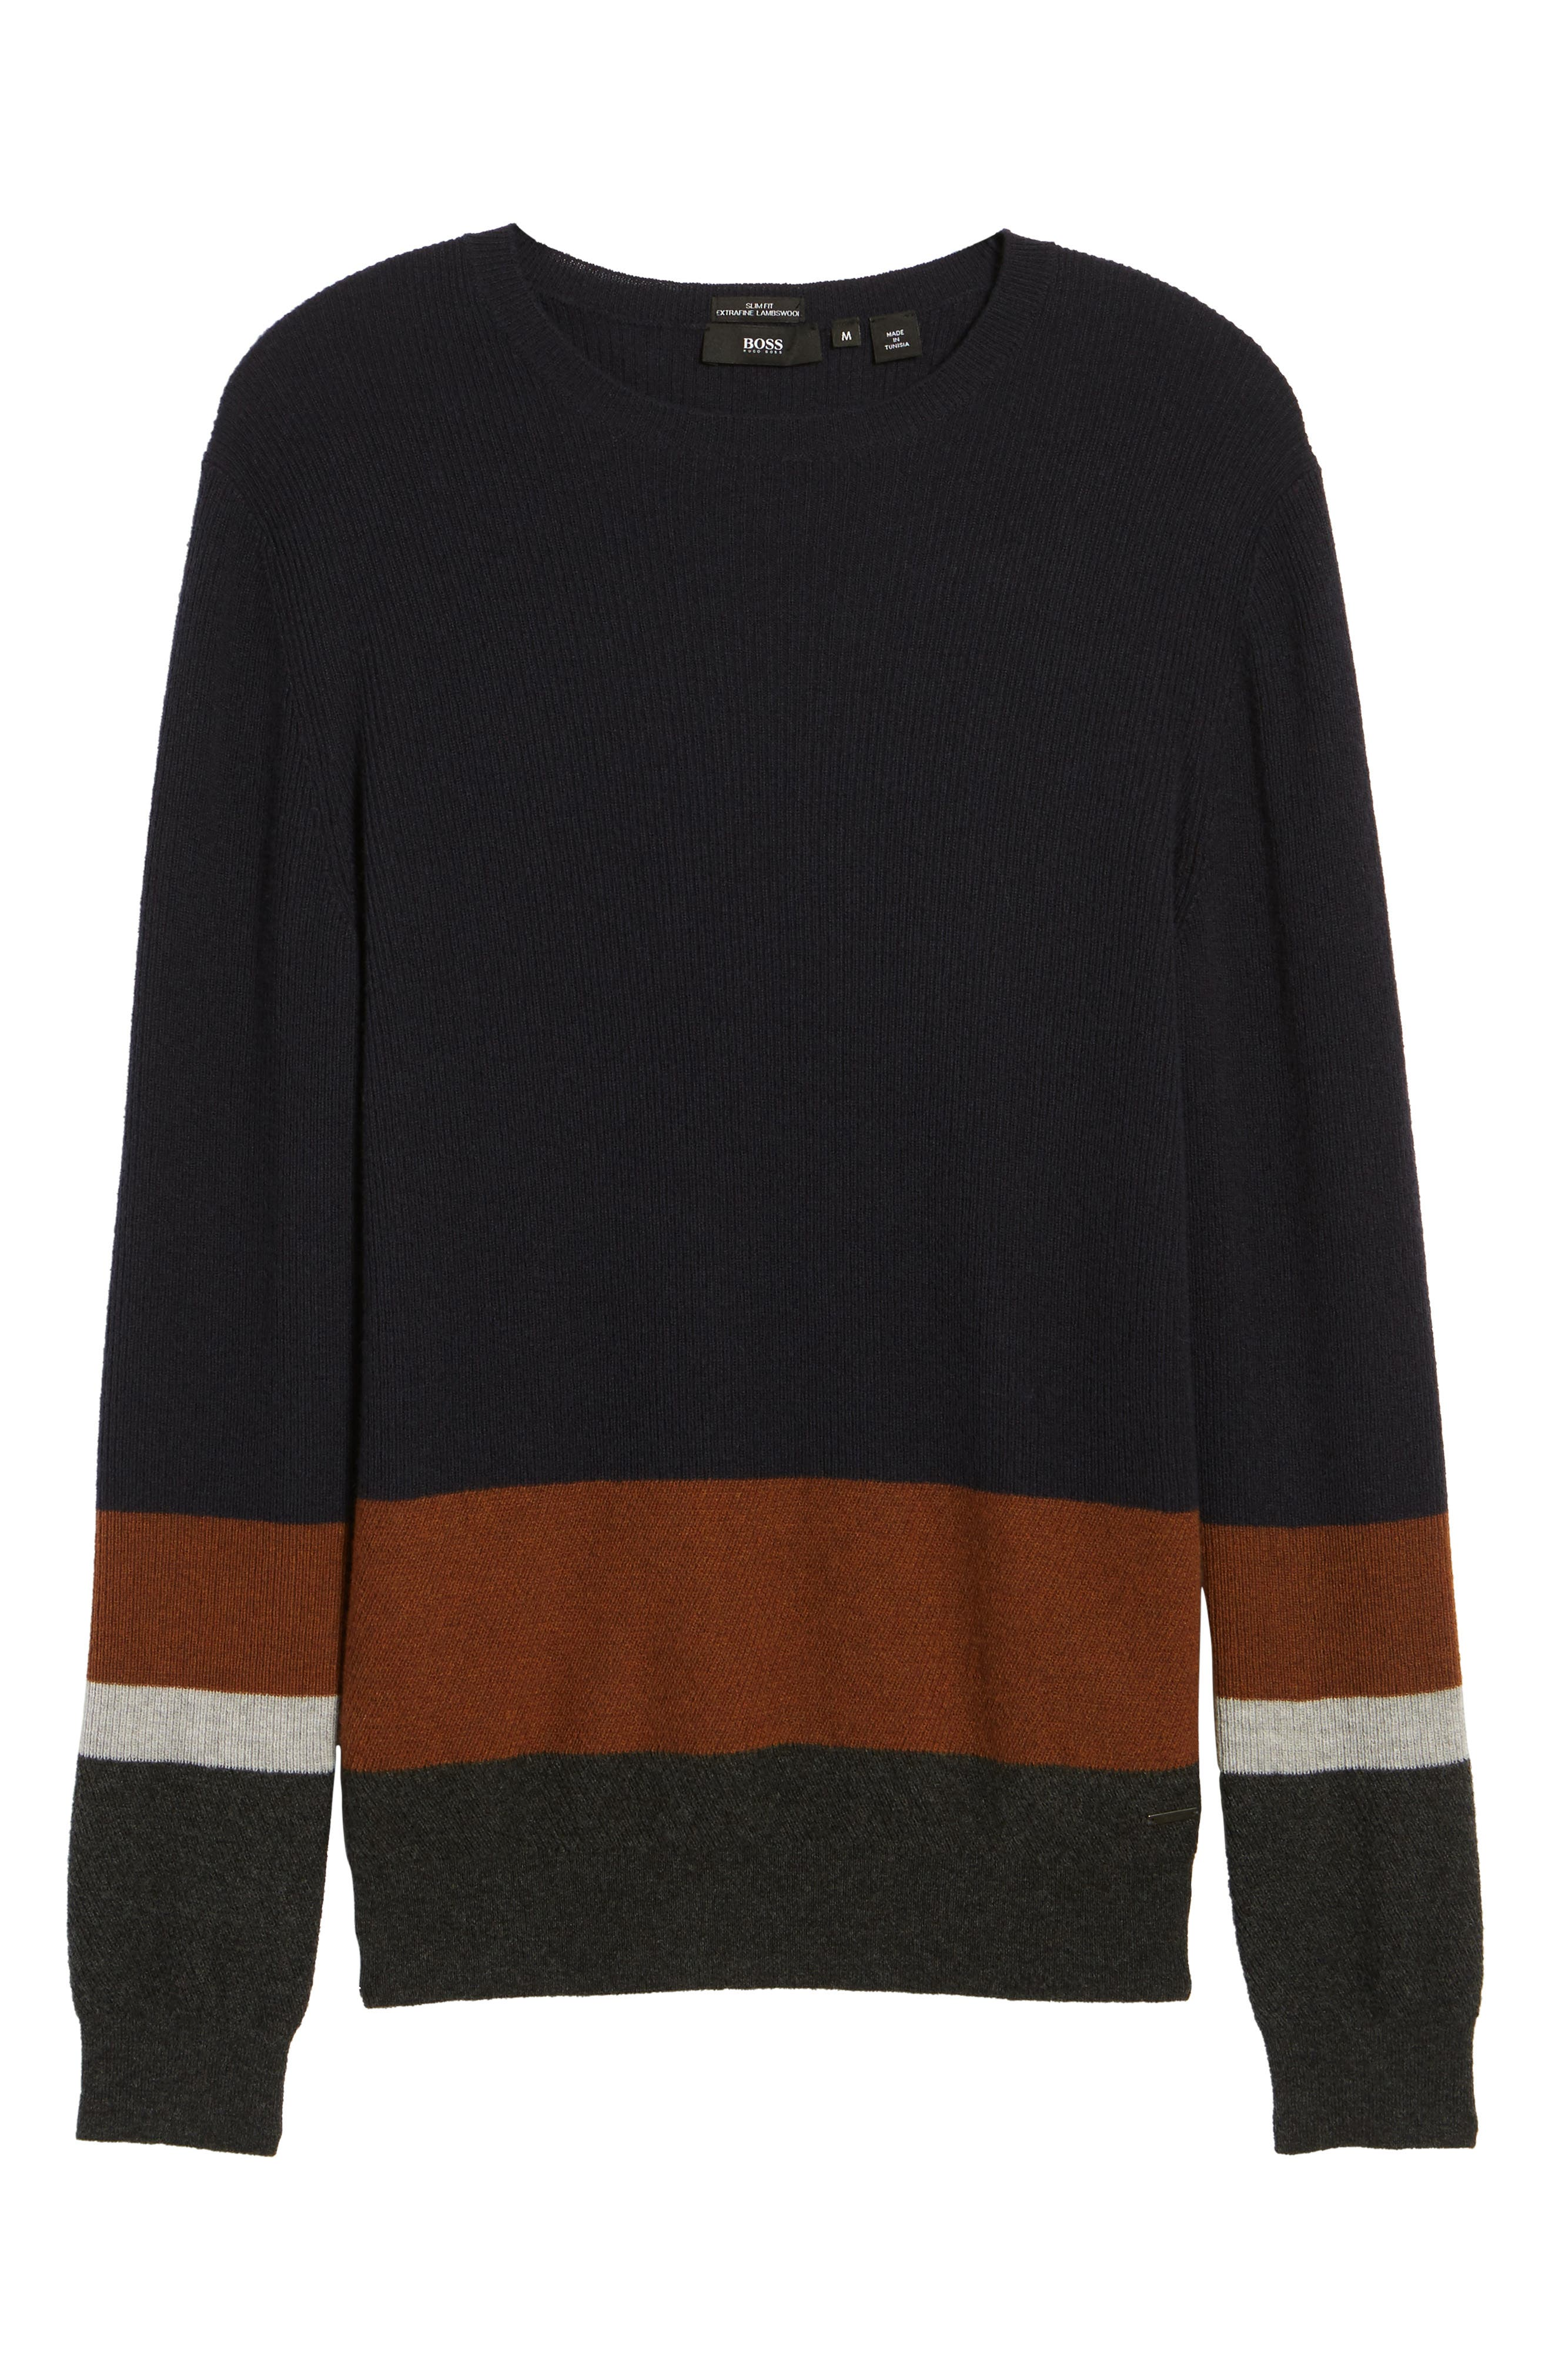 Colorblock Crewneck Sweater,                             Alternate thumbnail 5, color,                             Navy